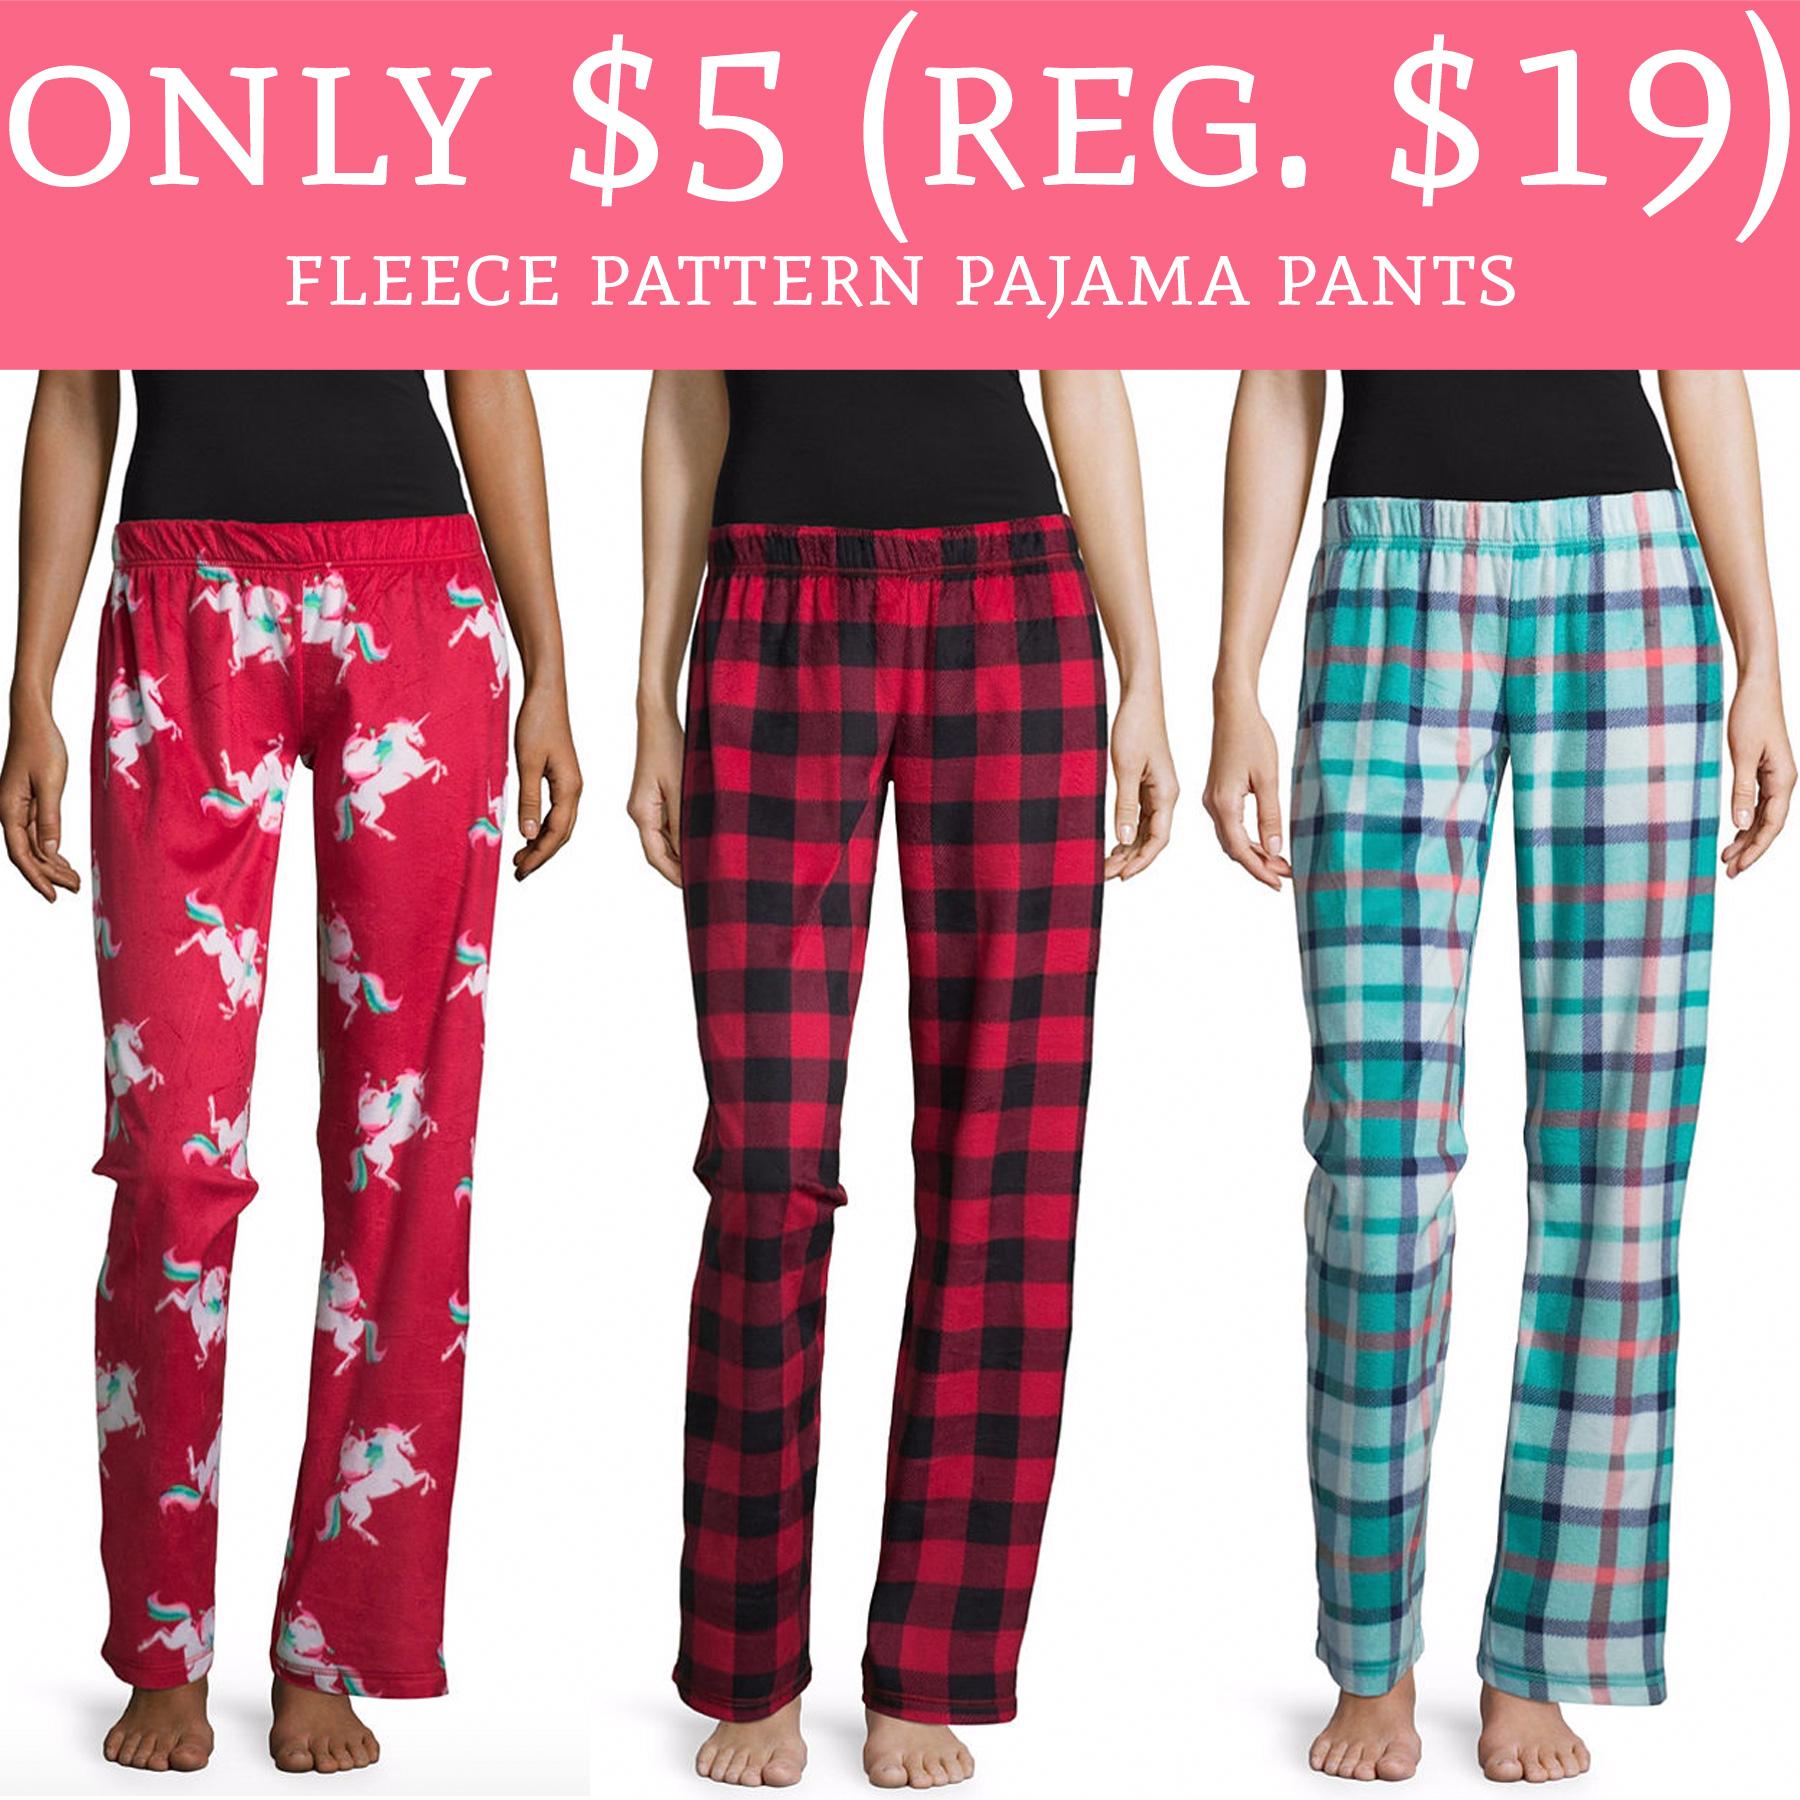 glad kitchen bags cookware whoa! only $5 (regular $19) fleece pattern pajama pants ...